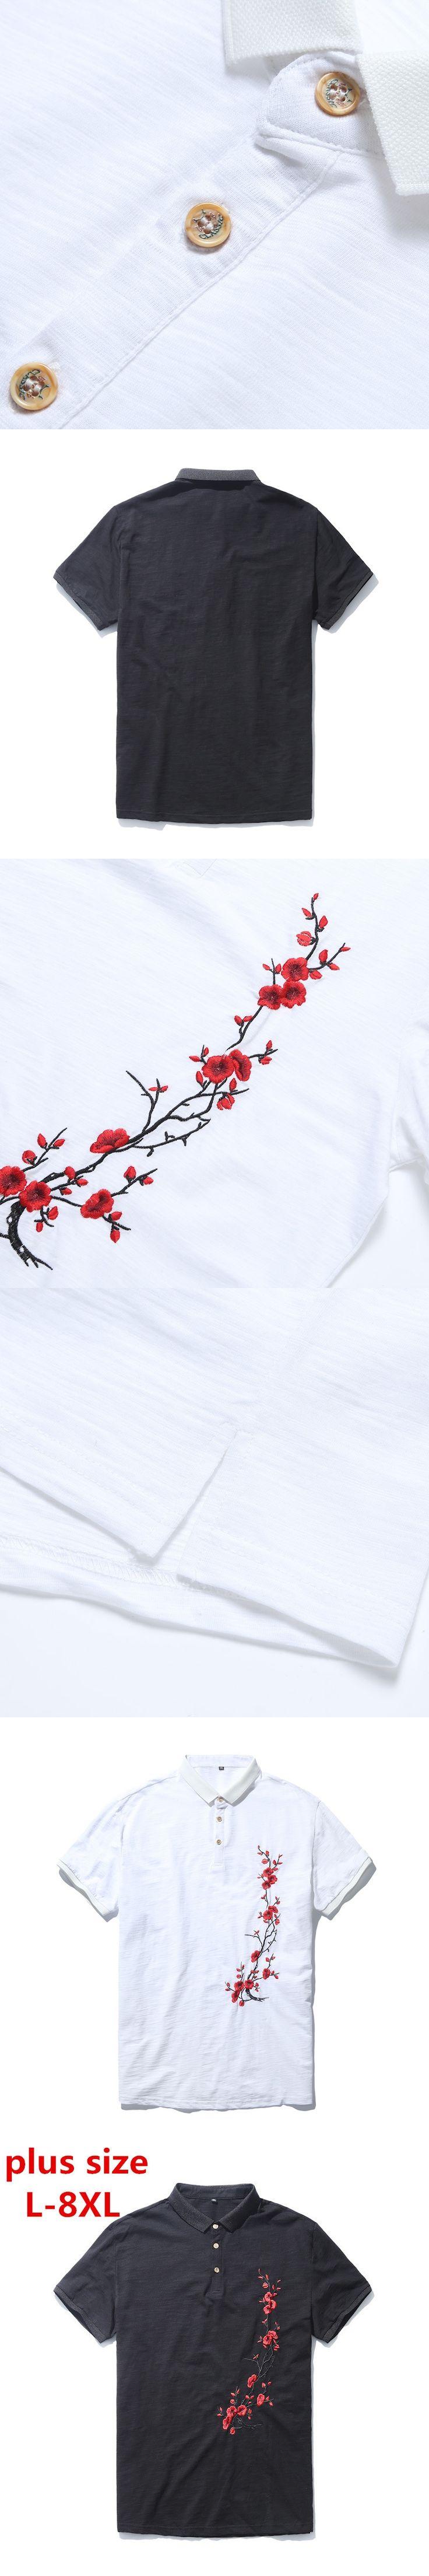 Plus size 8xl 7xl 6xl 5xl 4xl Embroidery Men Polo Shirt Slim Fit Short Sleeve 100% Cotton Brand Clothing Fashion Summer big size